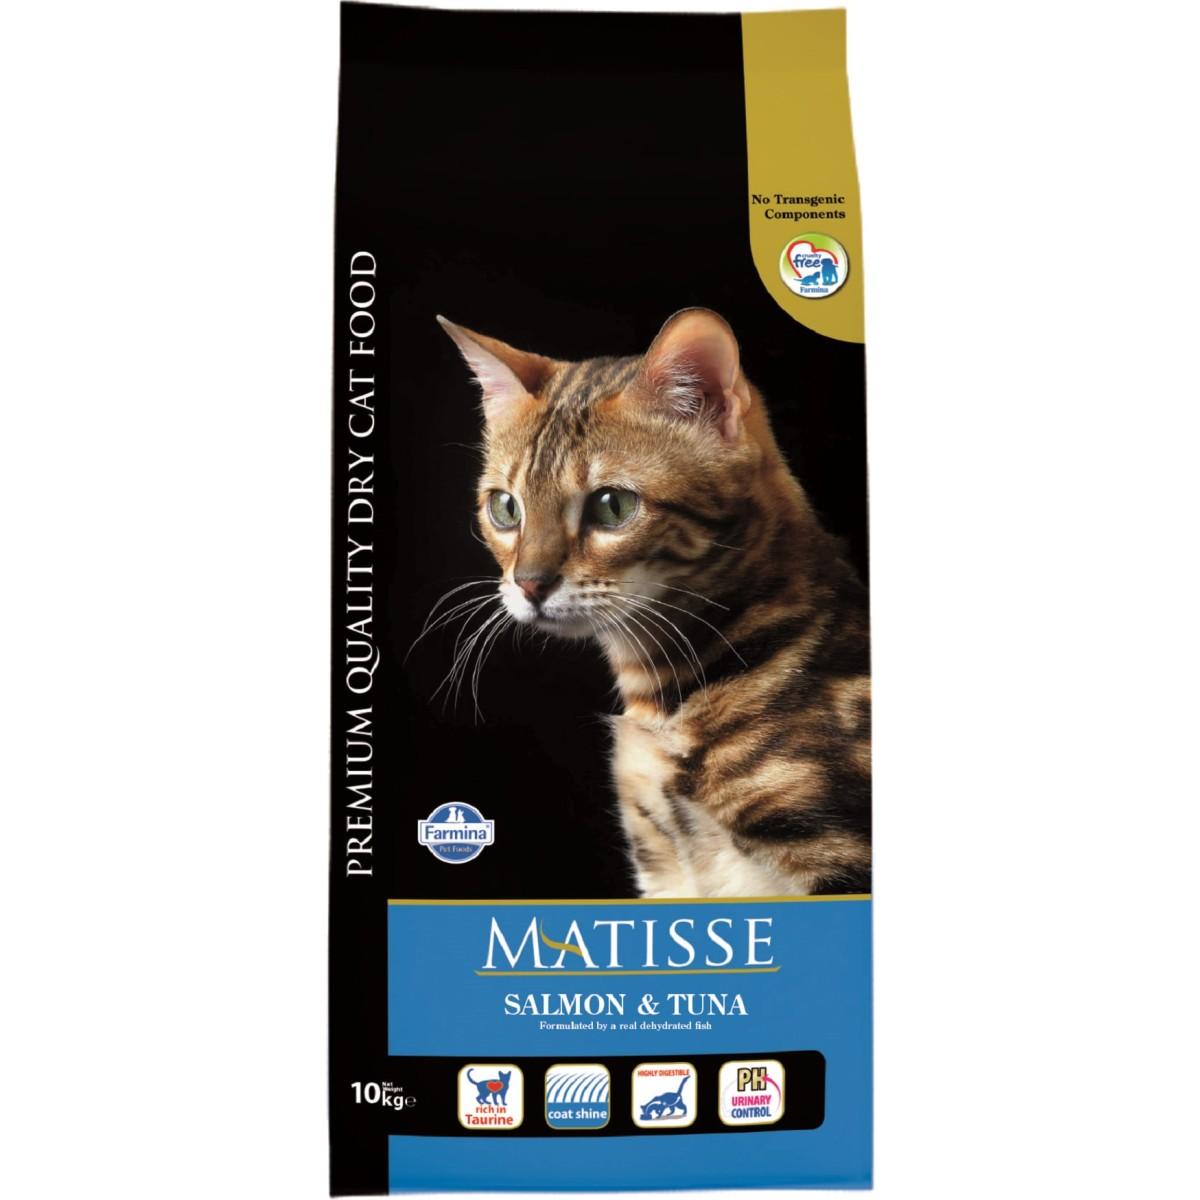 Сухой корм для кошек MATISSE Salmon & Tuna Лосось Тунец 10 кг